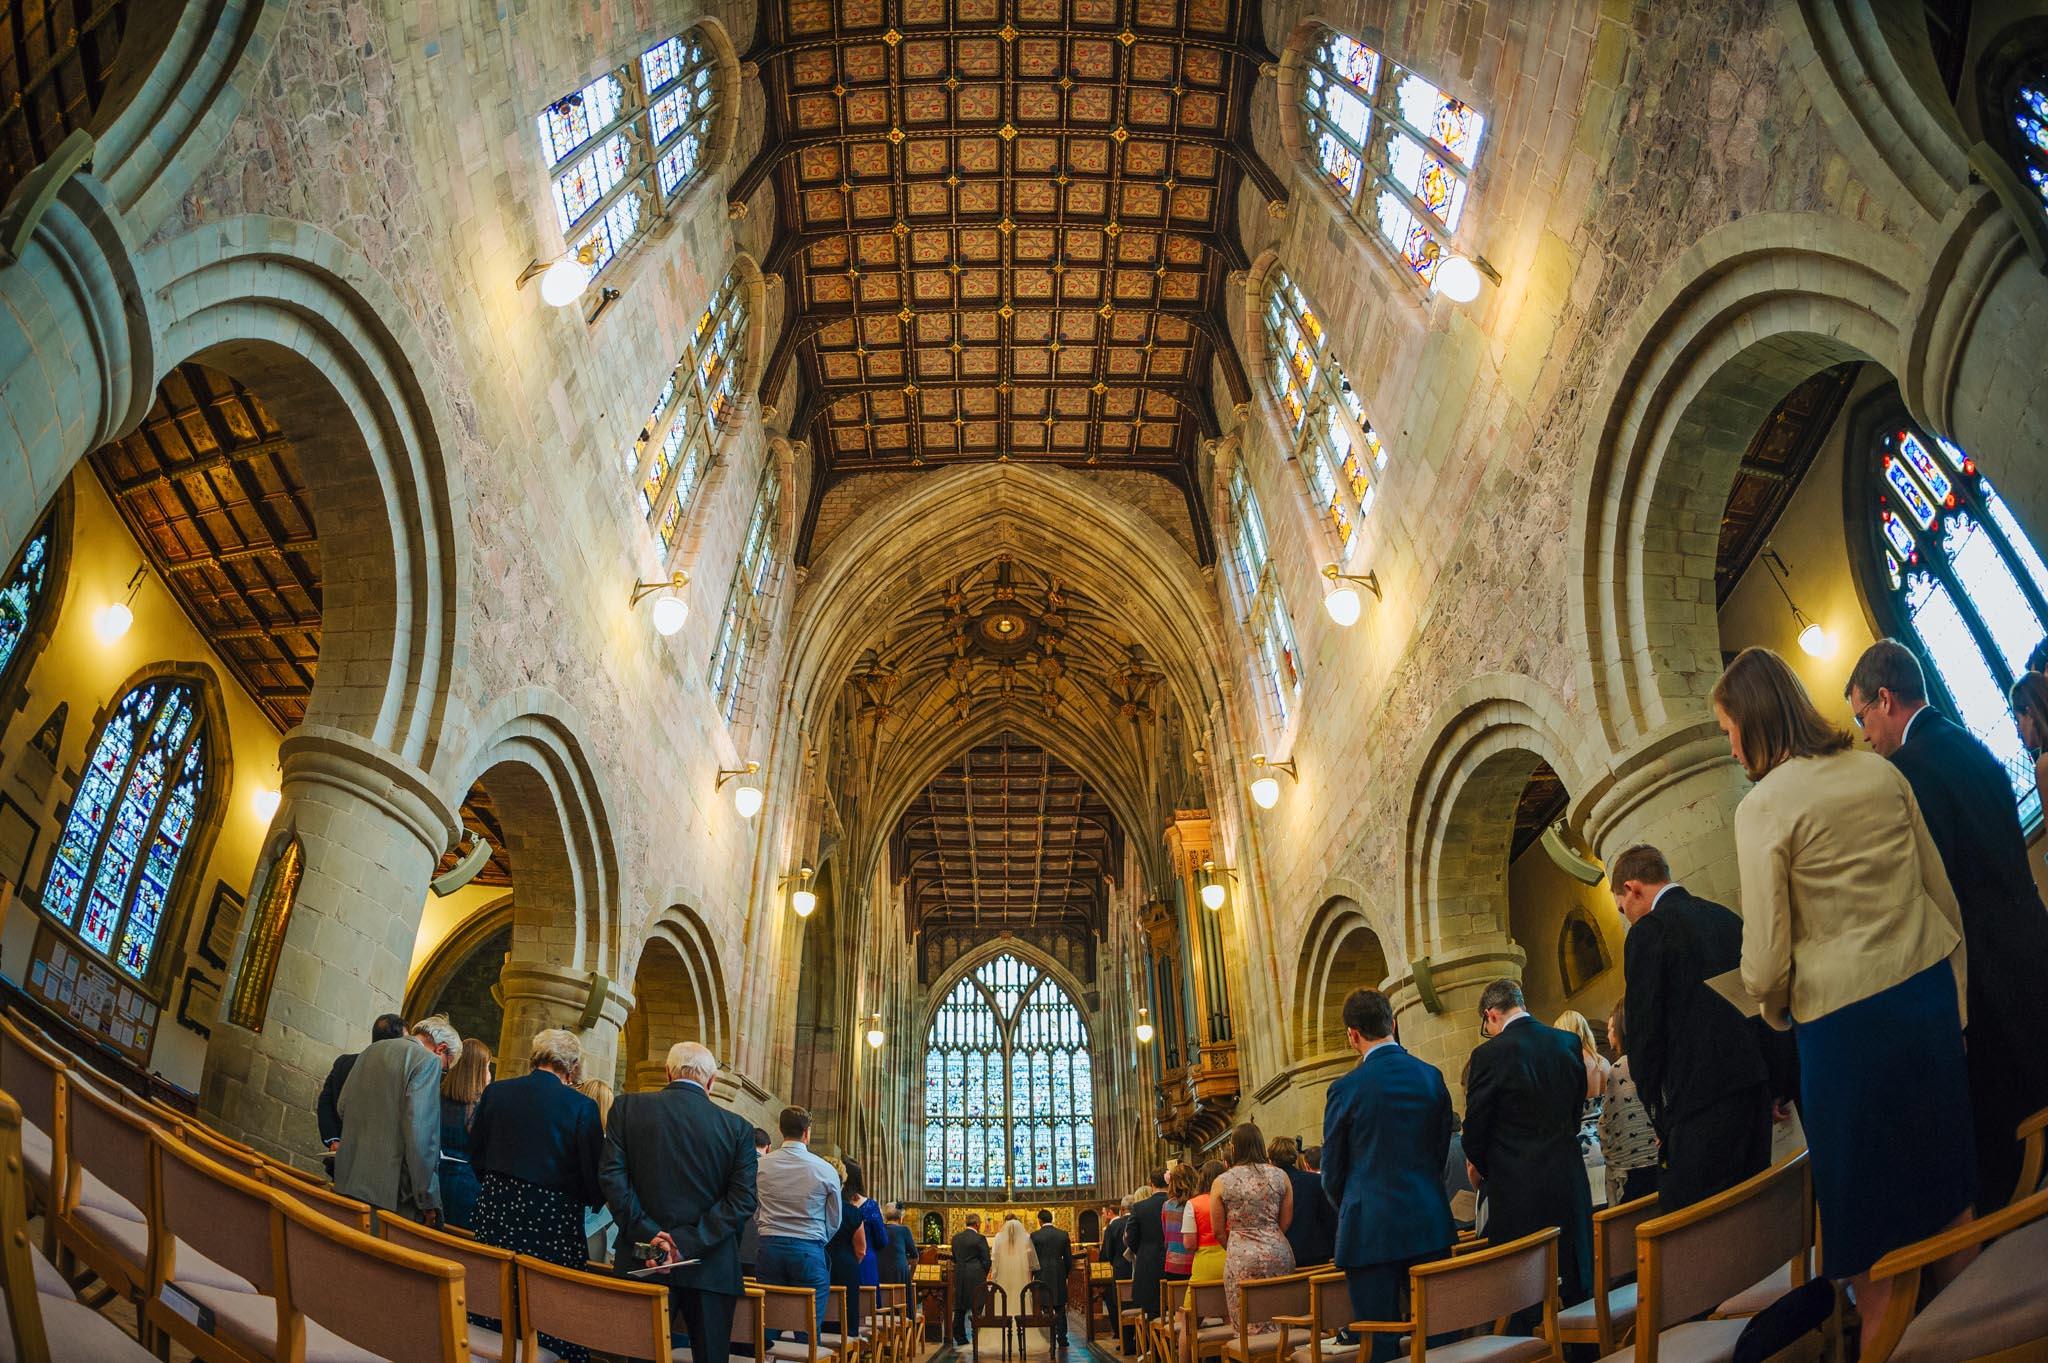 Georgina + Mike - Wedding photography in Malvern, Worcestershire 26